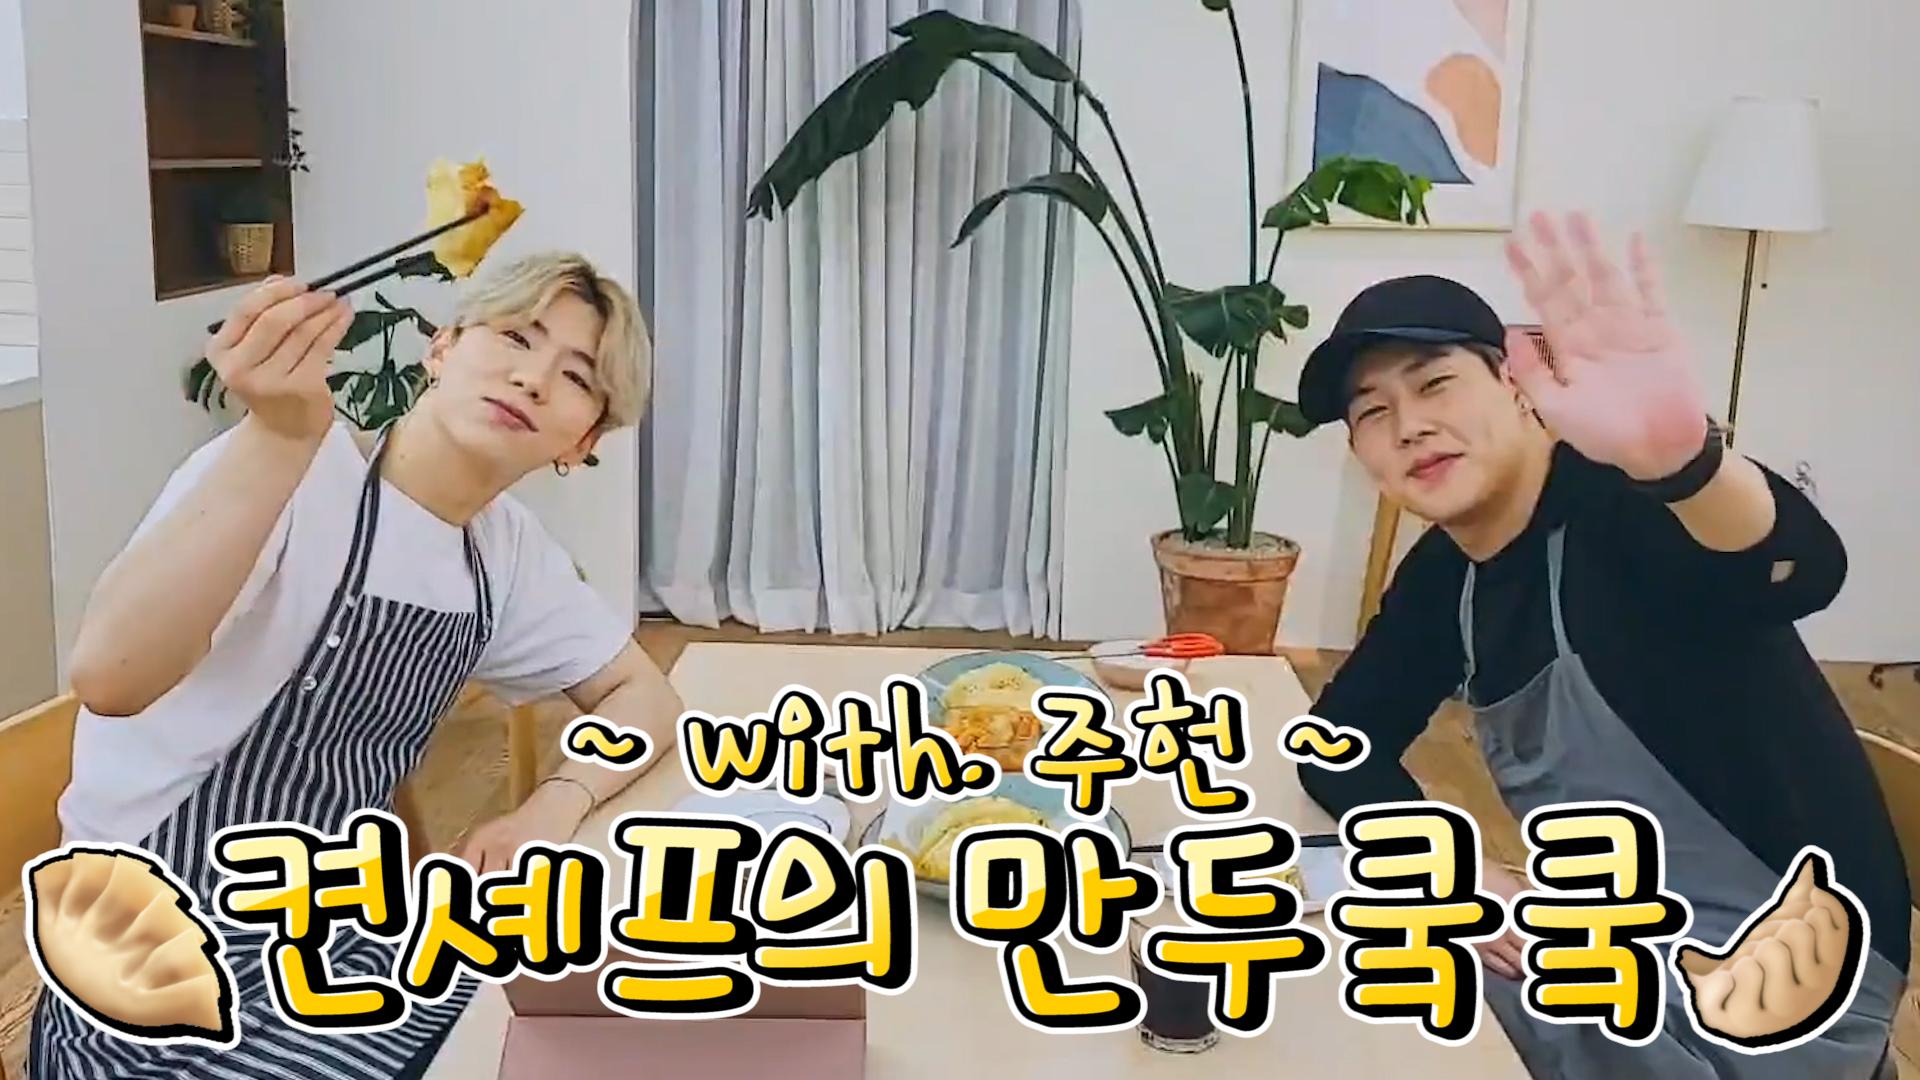 [MONSTA X] 투체인의 만두라면 만두피만 8m라도 파헤치고 들어갈 거라구요 🥟🚧 (KIHYUN&JOOHONEY making dumpling)